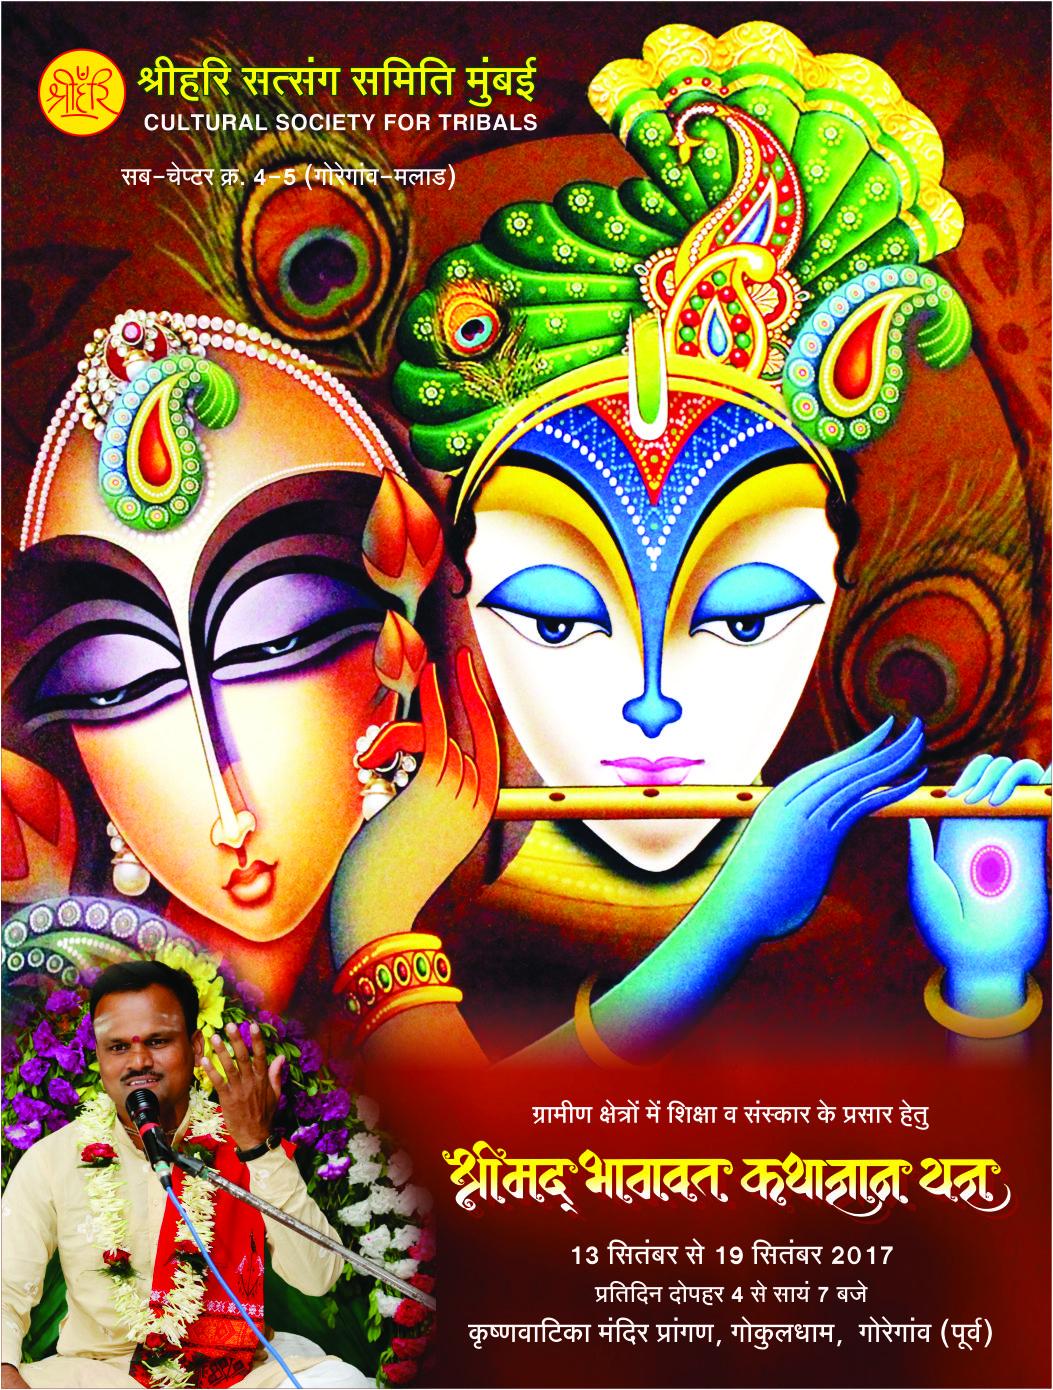 Bhagwat katha card printed fro shrihari satsang samiti invitation bhagwat katha card printed fro shrihari satsang samiti stopboris Gallery